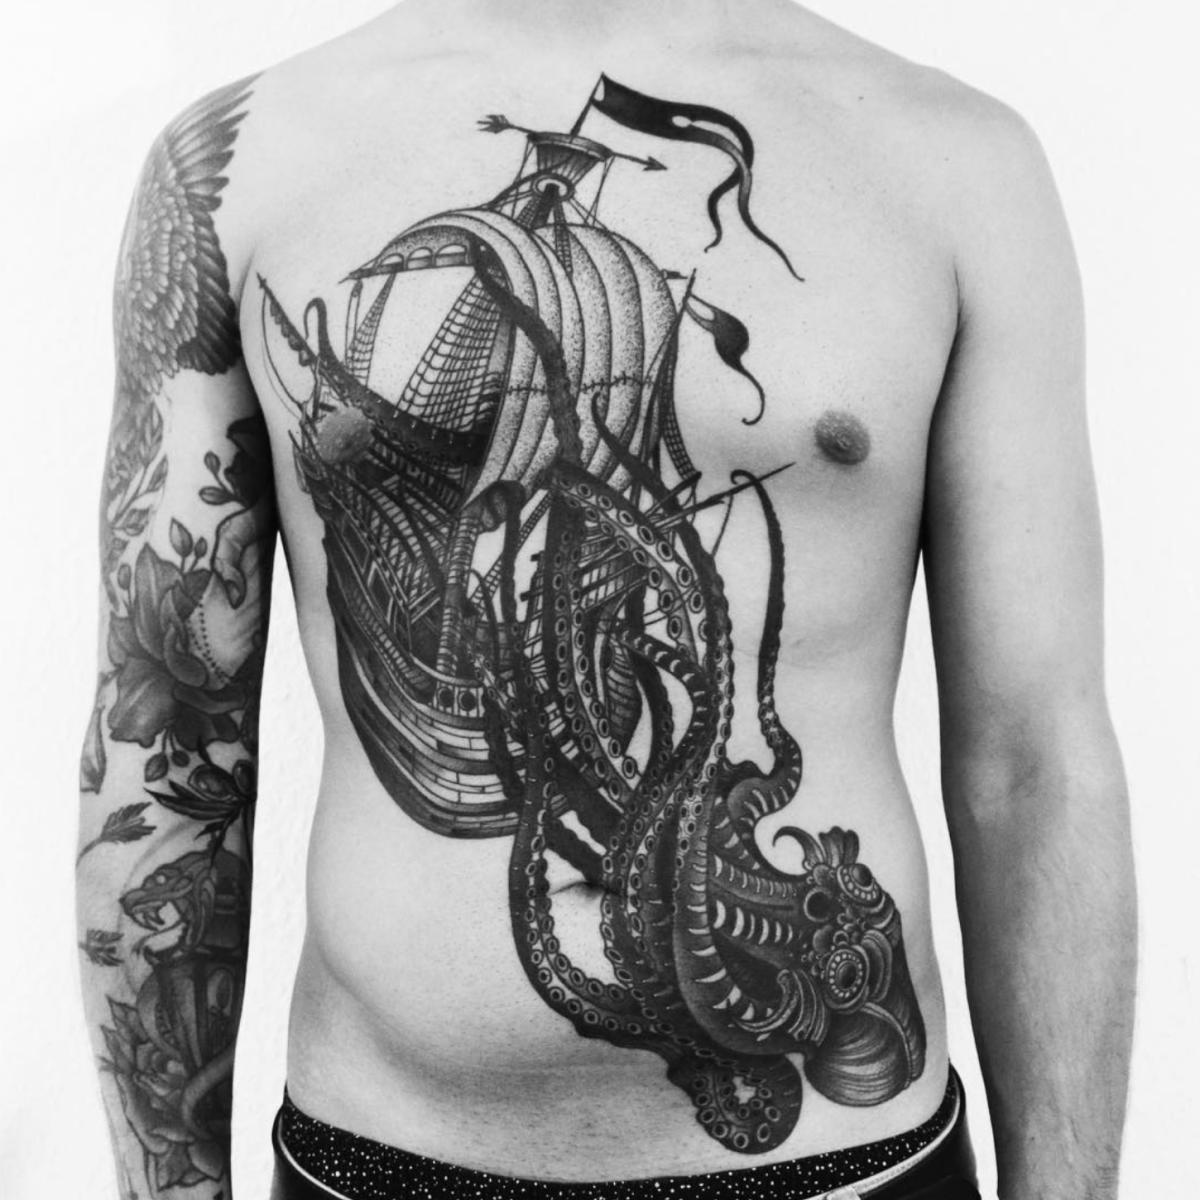 By Oleksandra Riabichko @oleksas.tattoos of Munich, Germany.